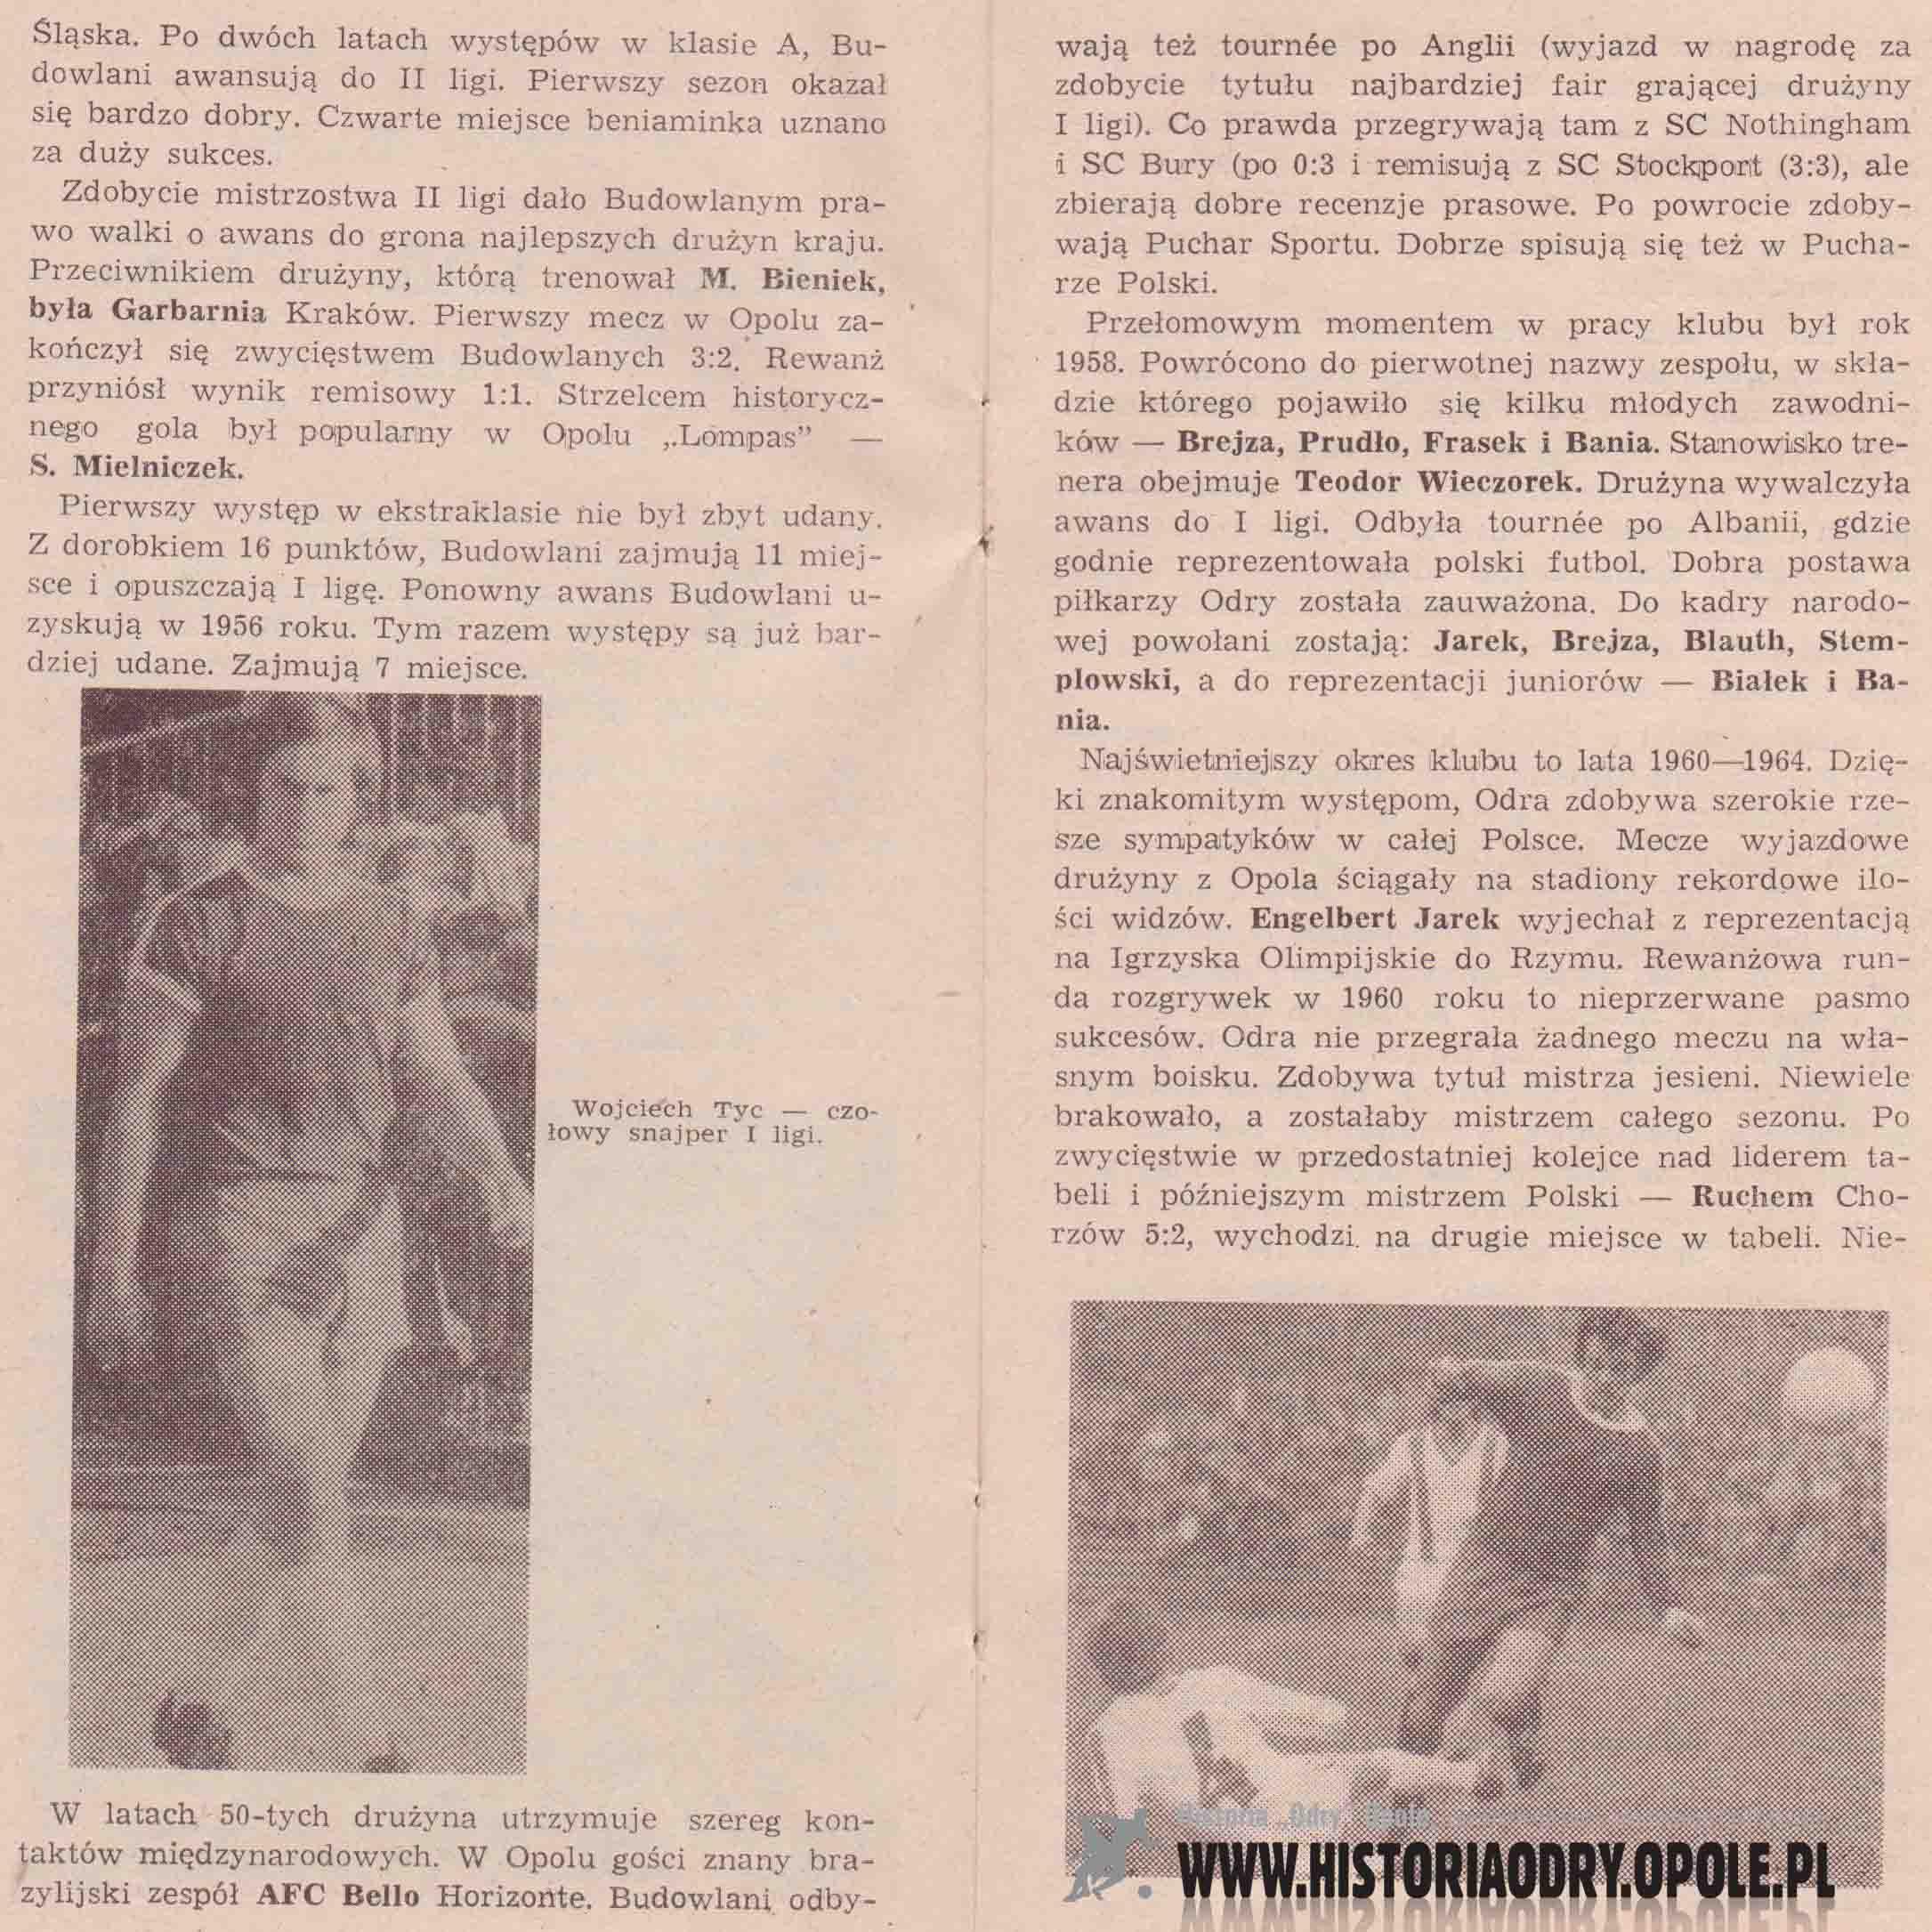 Odra Opole - 1. FC Magdeburg (broszurka 2).